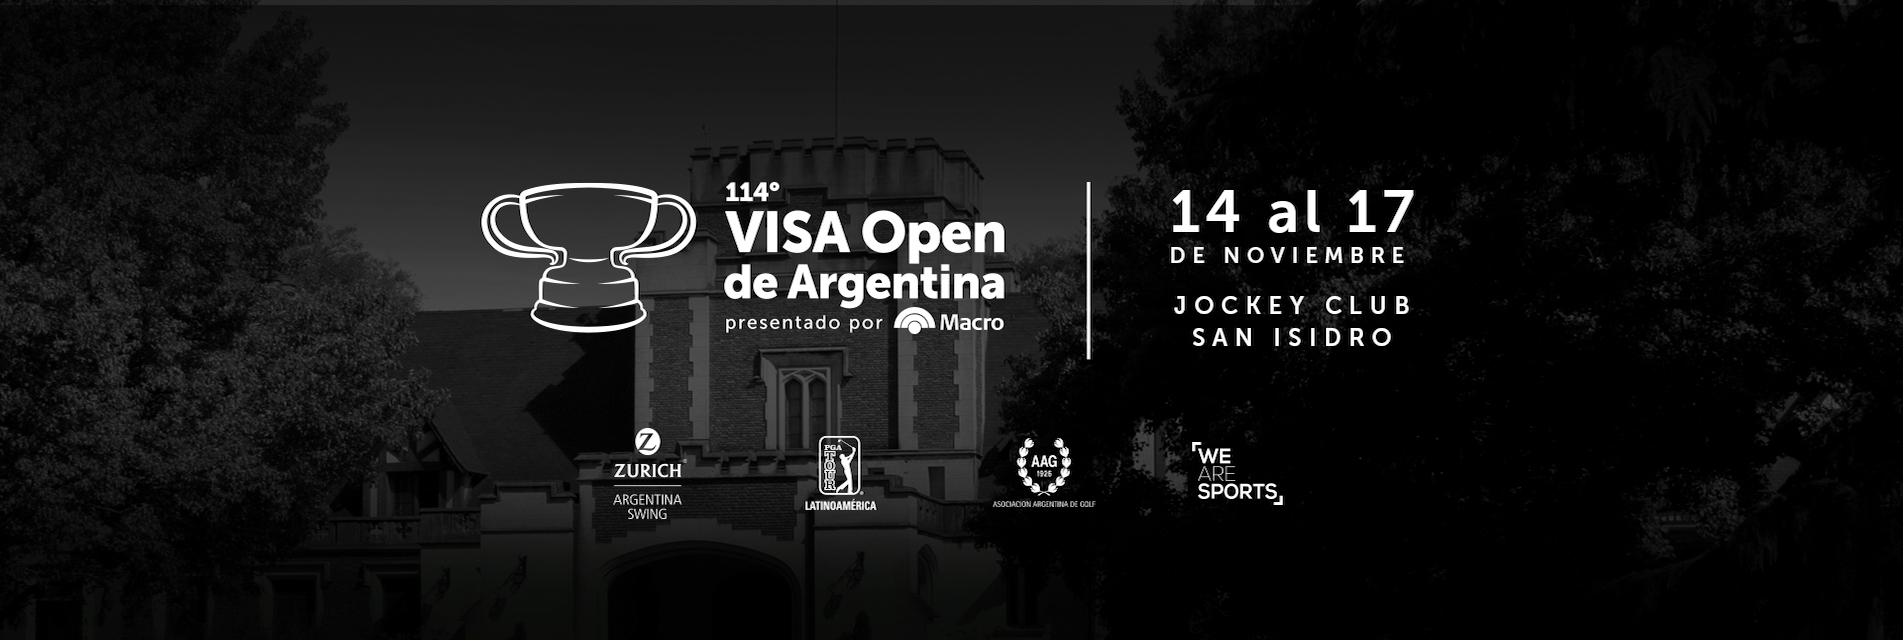 slide_visa open 114 (1)